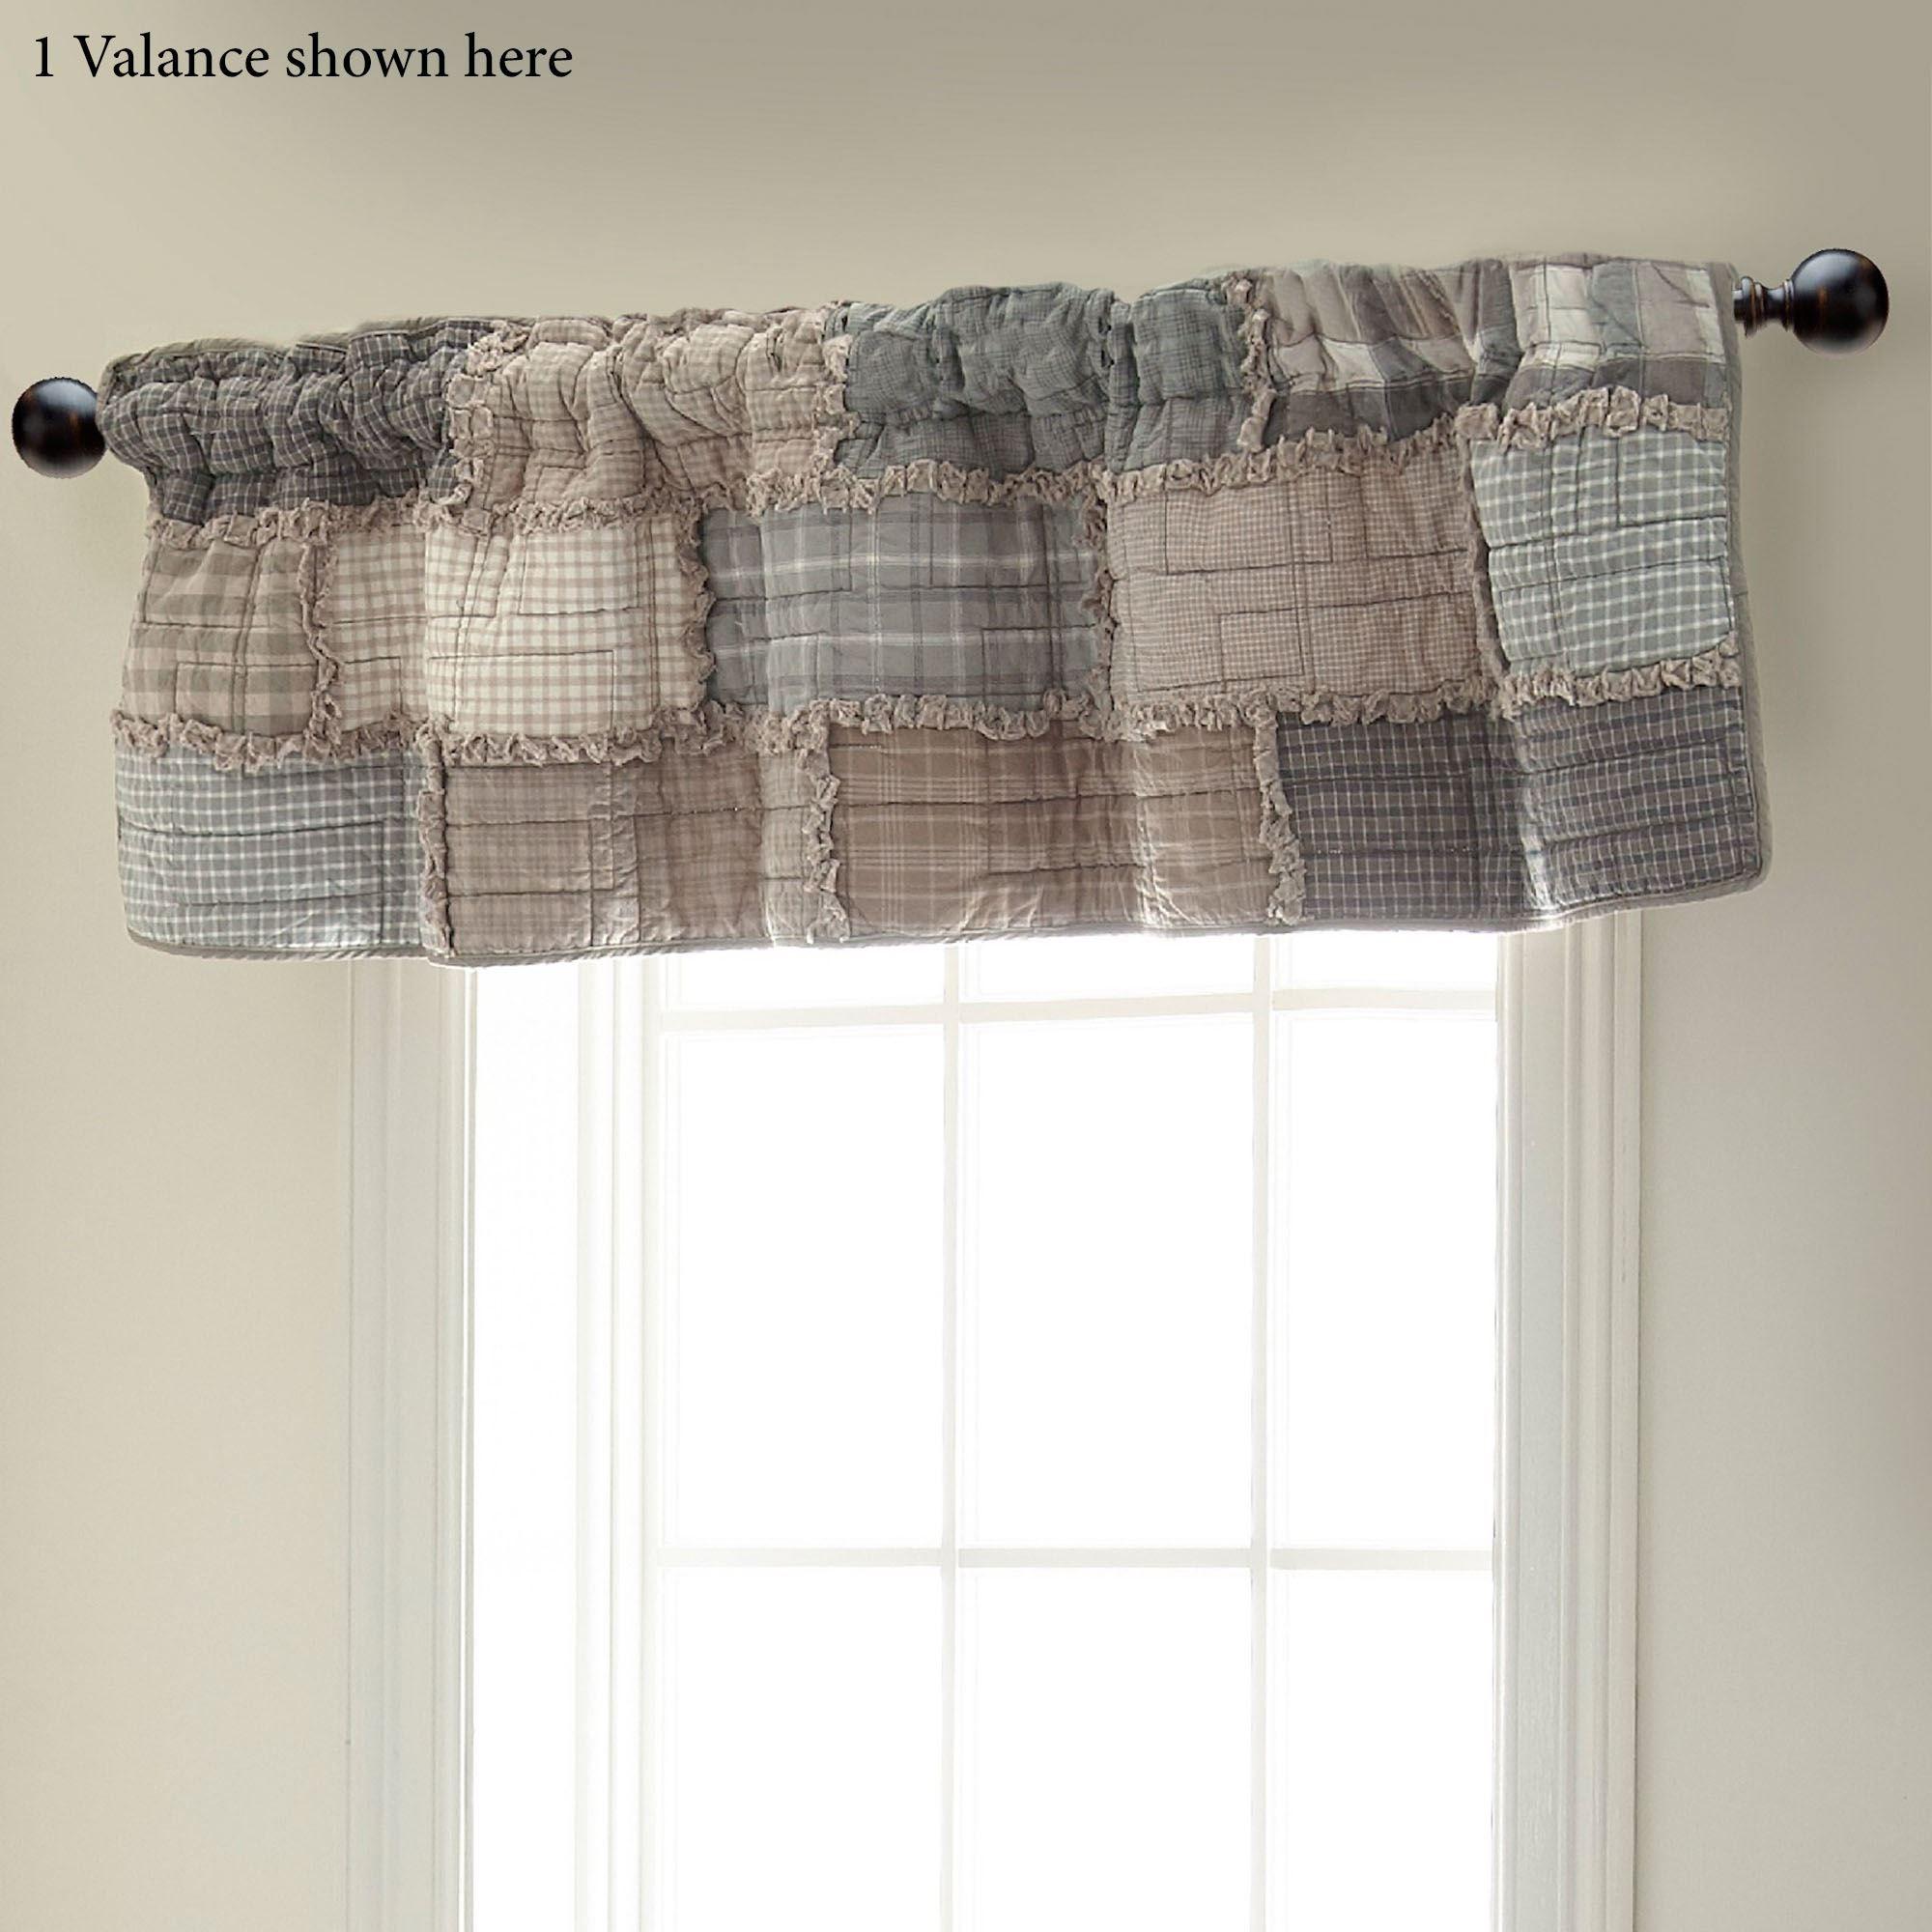 Smoky Cobblestone Patchwork Quilt Bedding By Donna Sharp